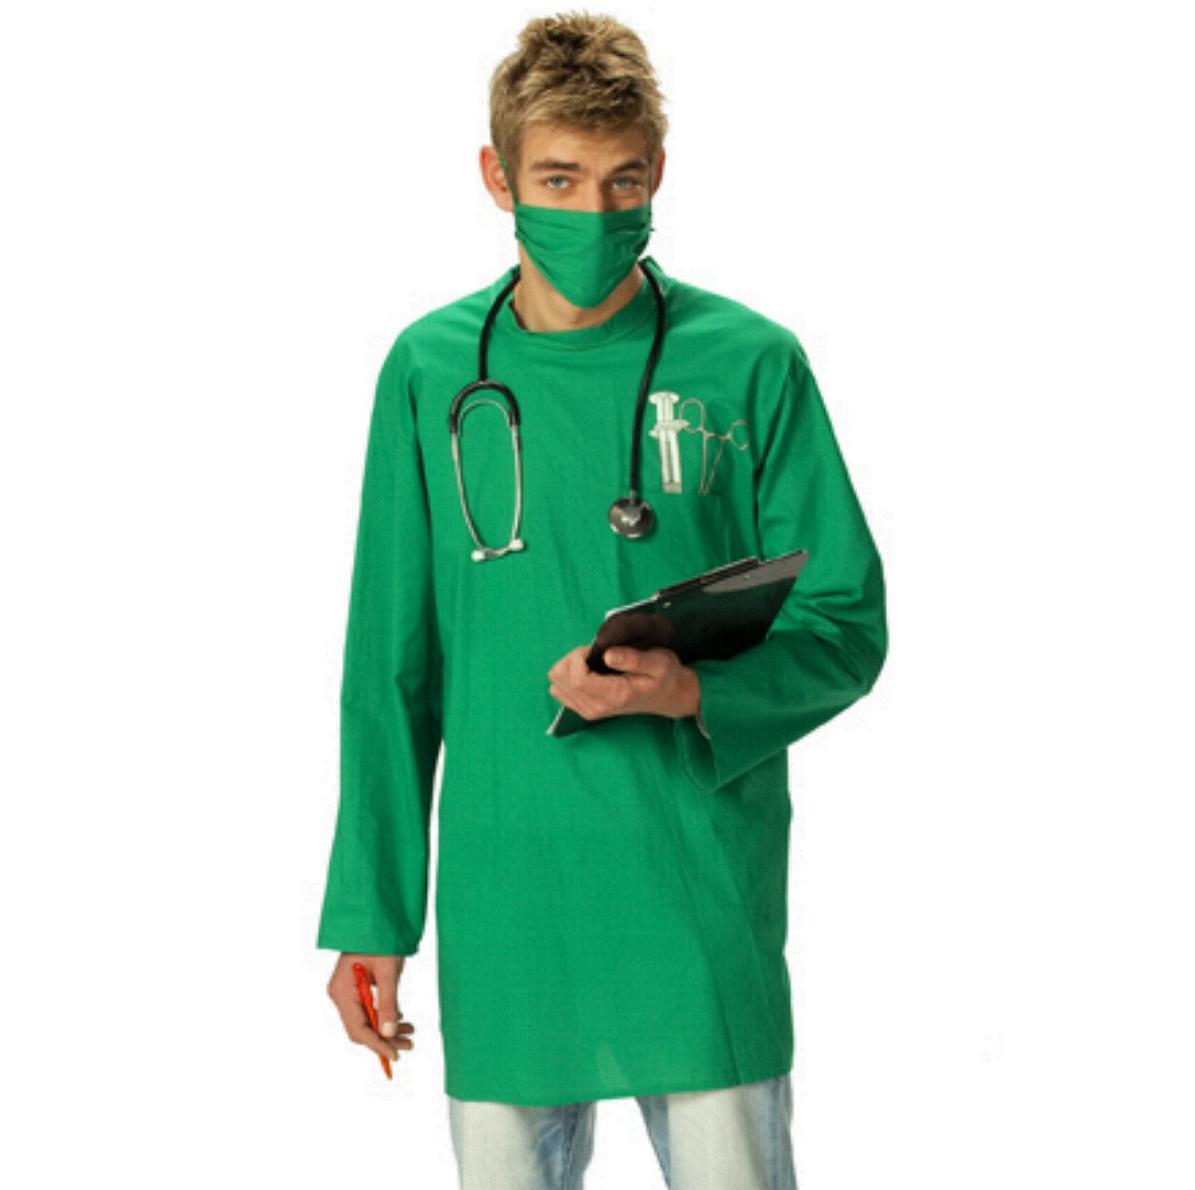 CHIRURG Kostüm, Arzt Doktor Kittel, Schürze,  50-52-54-56-58